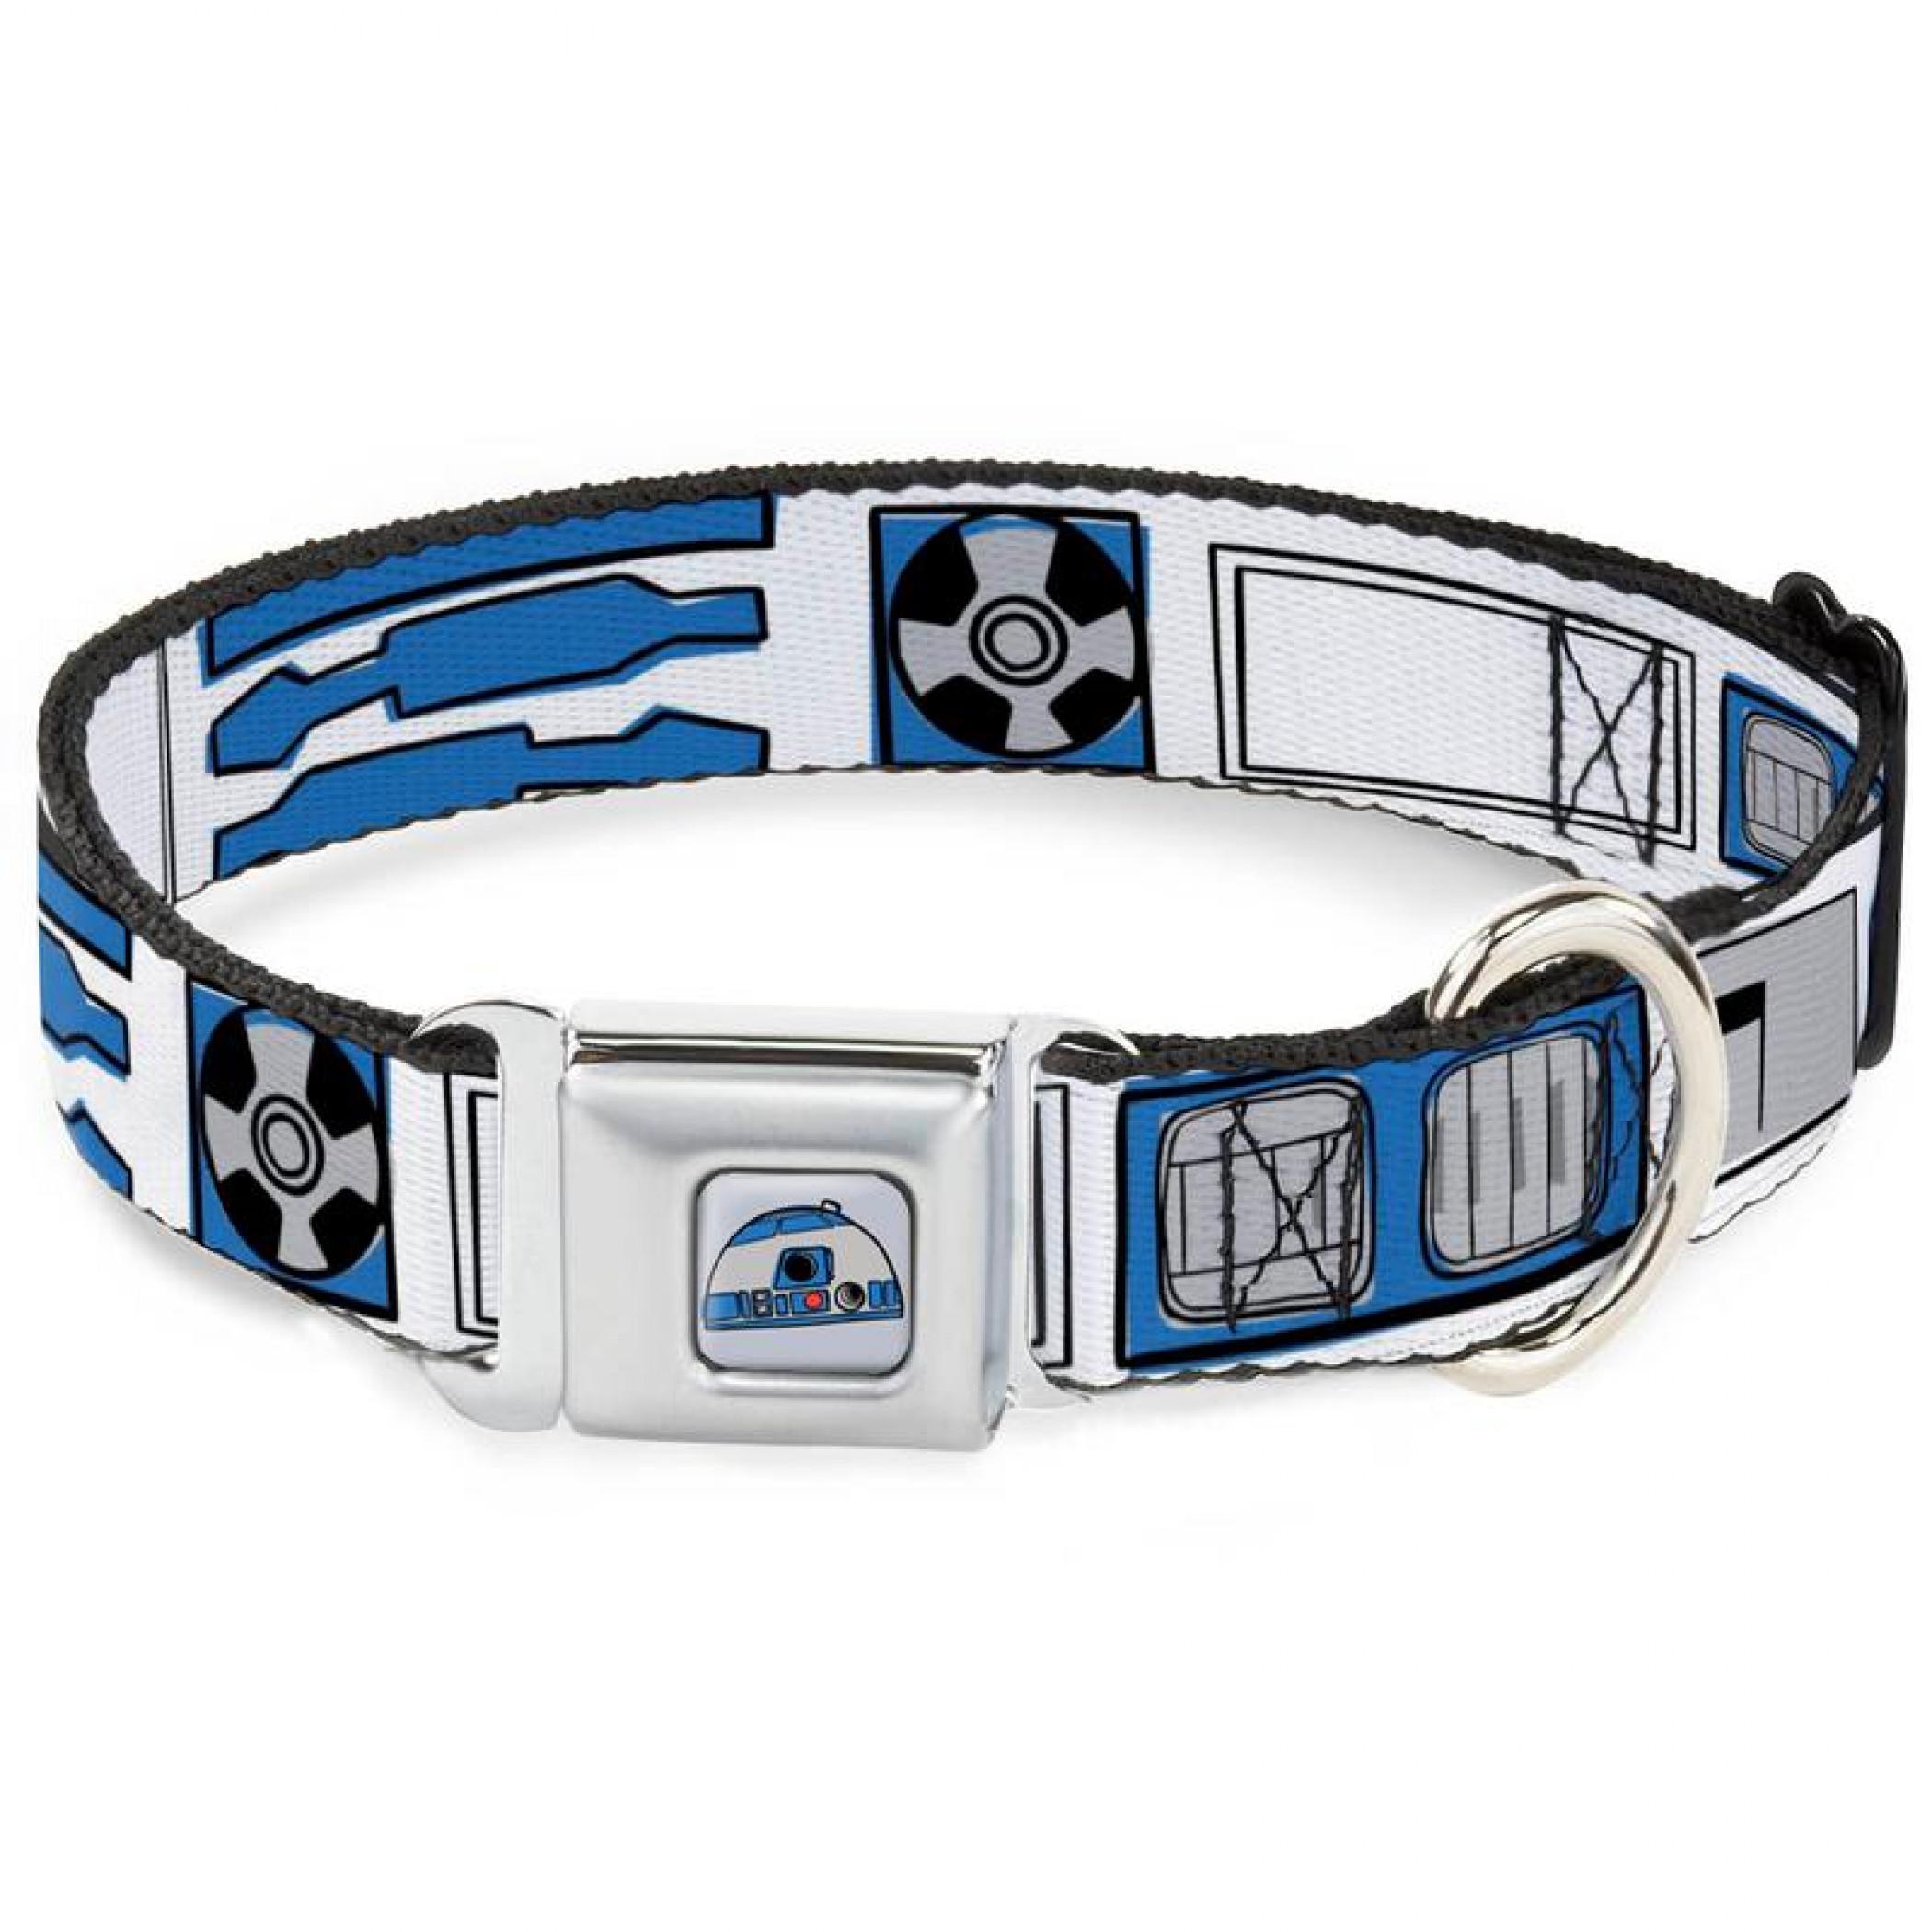 "Star Wars R2-D2 Costume 1"" Wide Dog Collar"